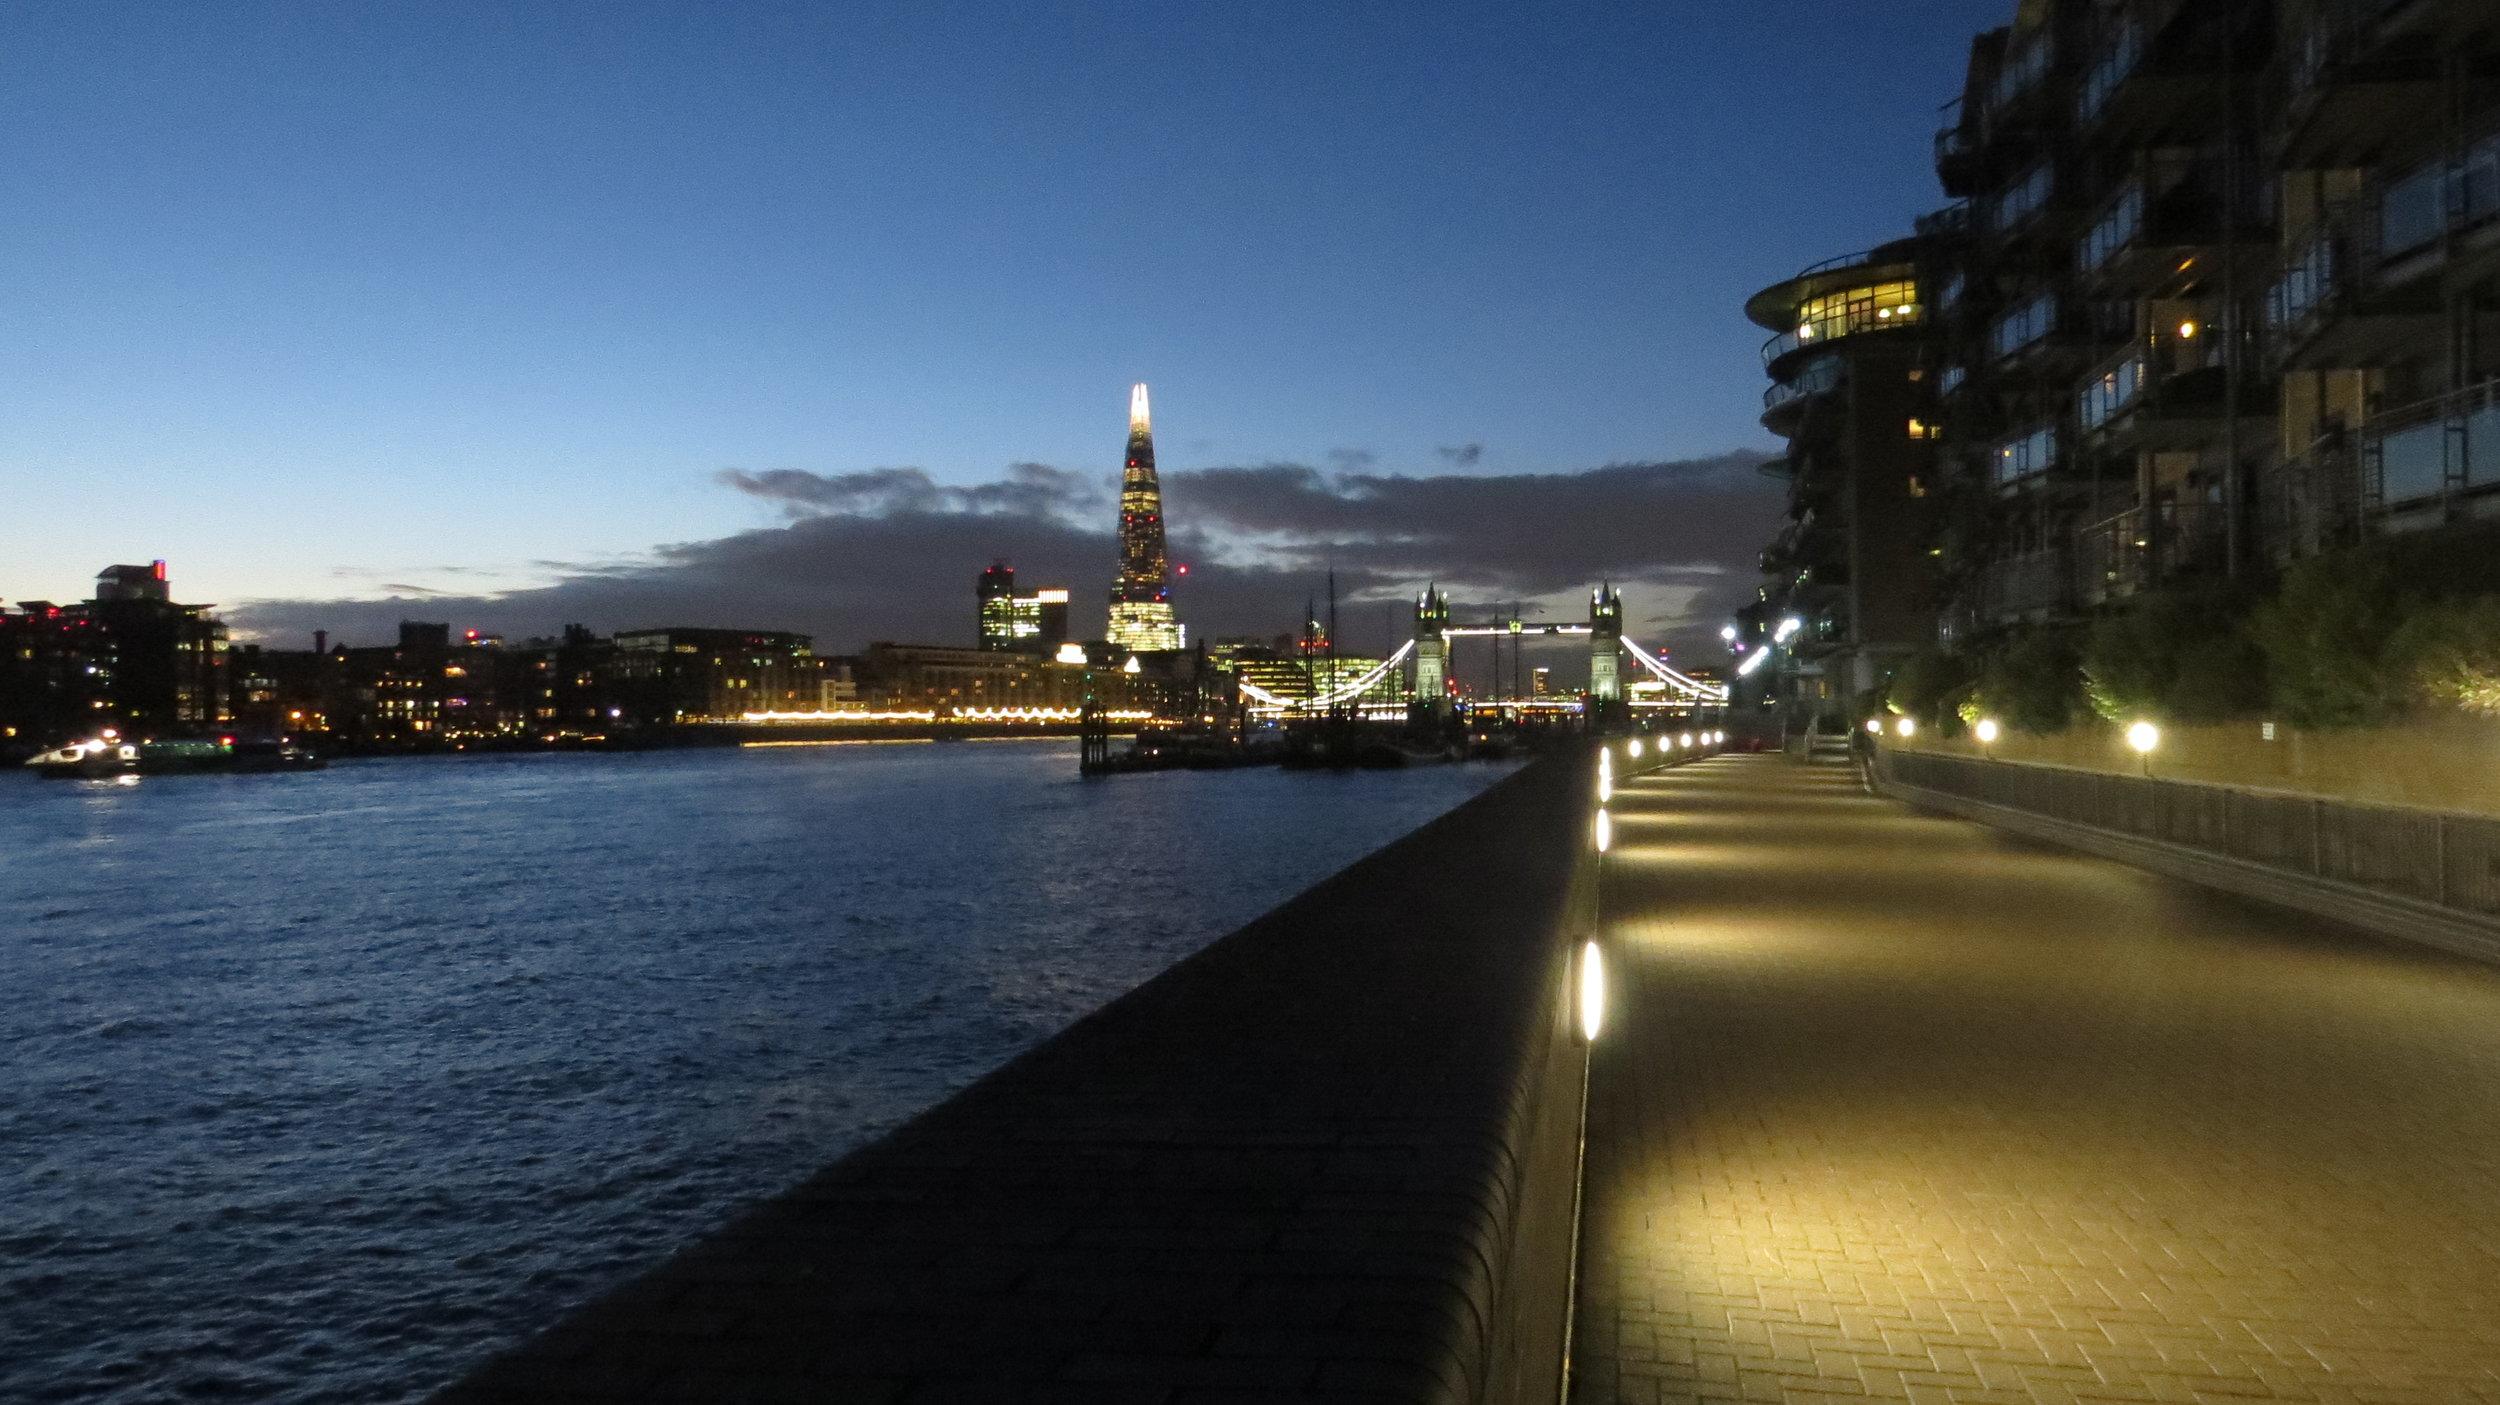 Twilight over Tower Bridge